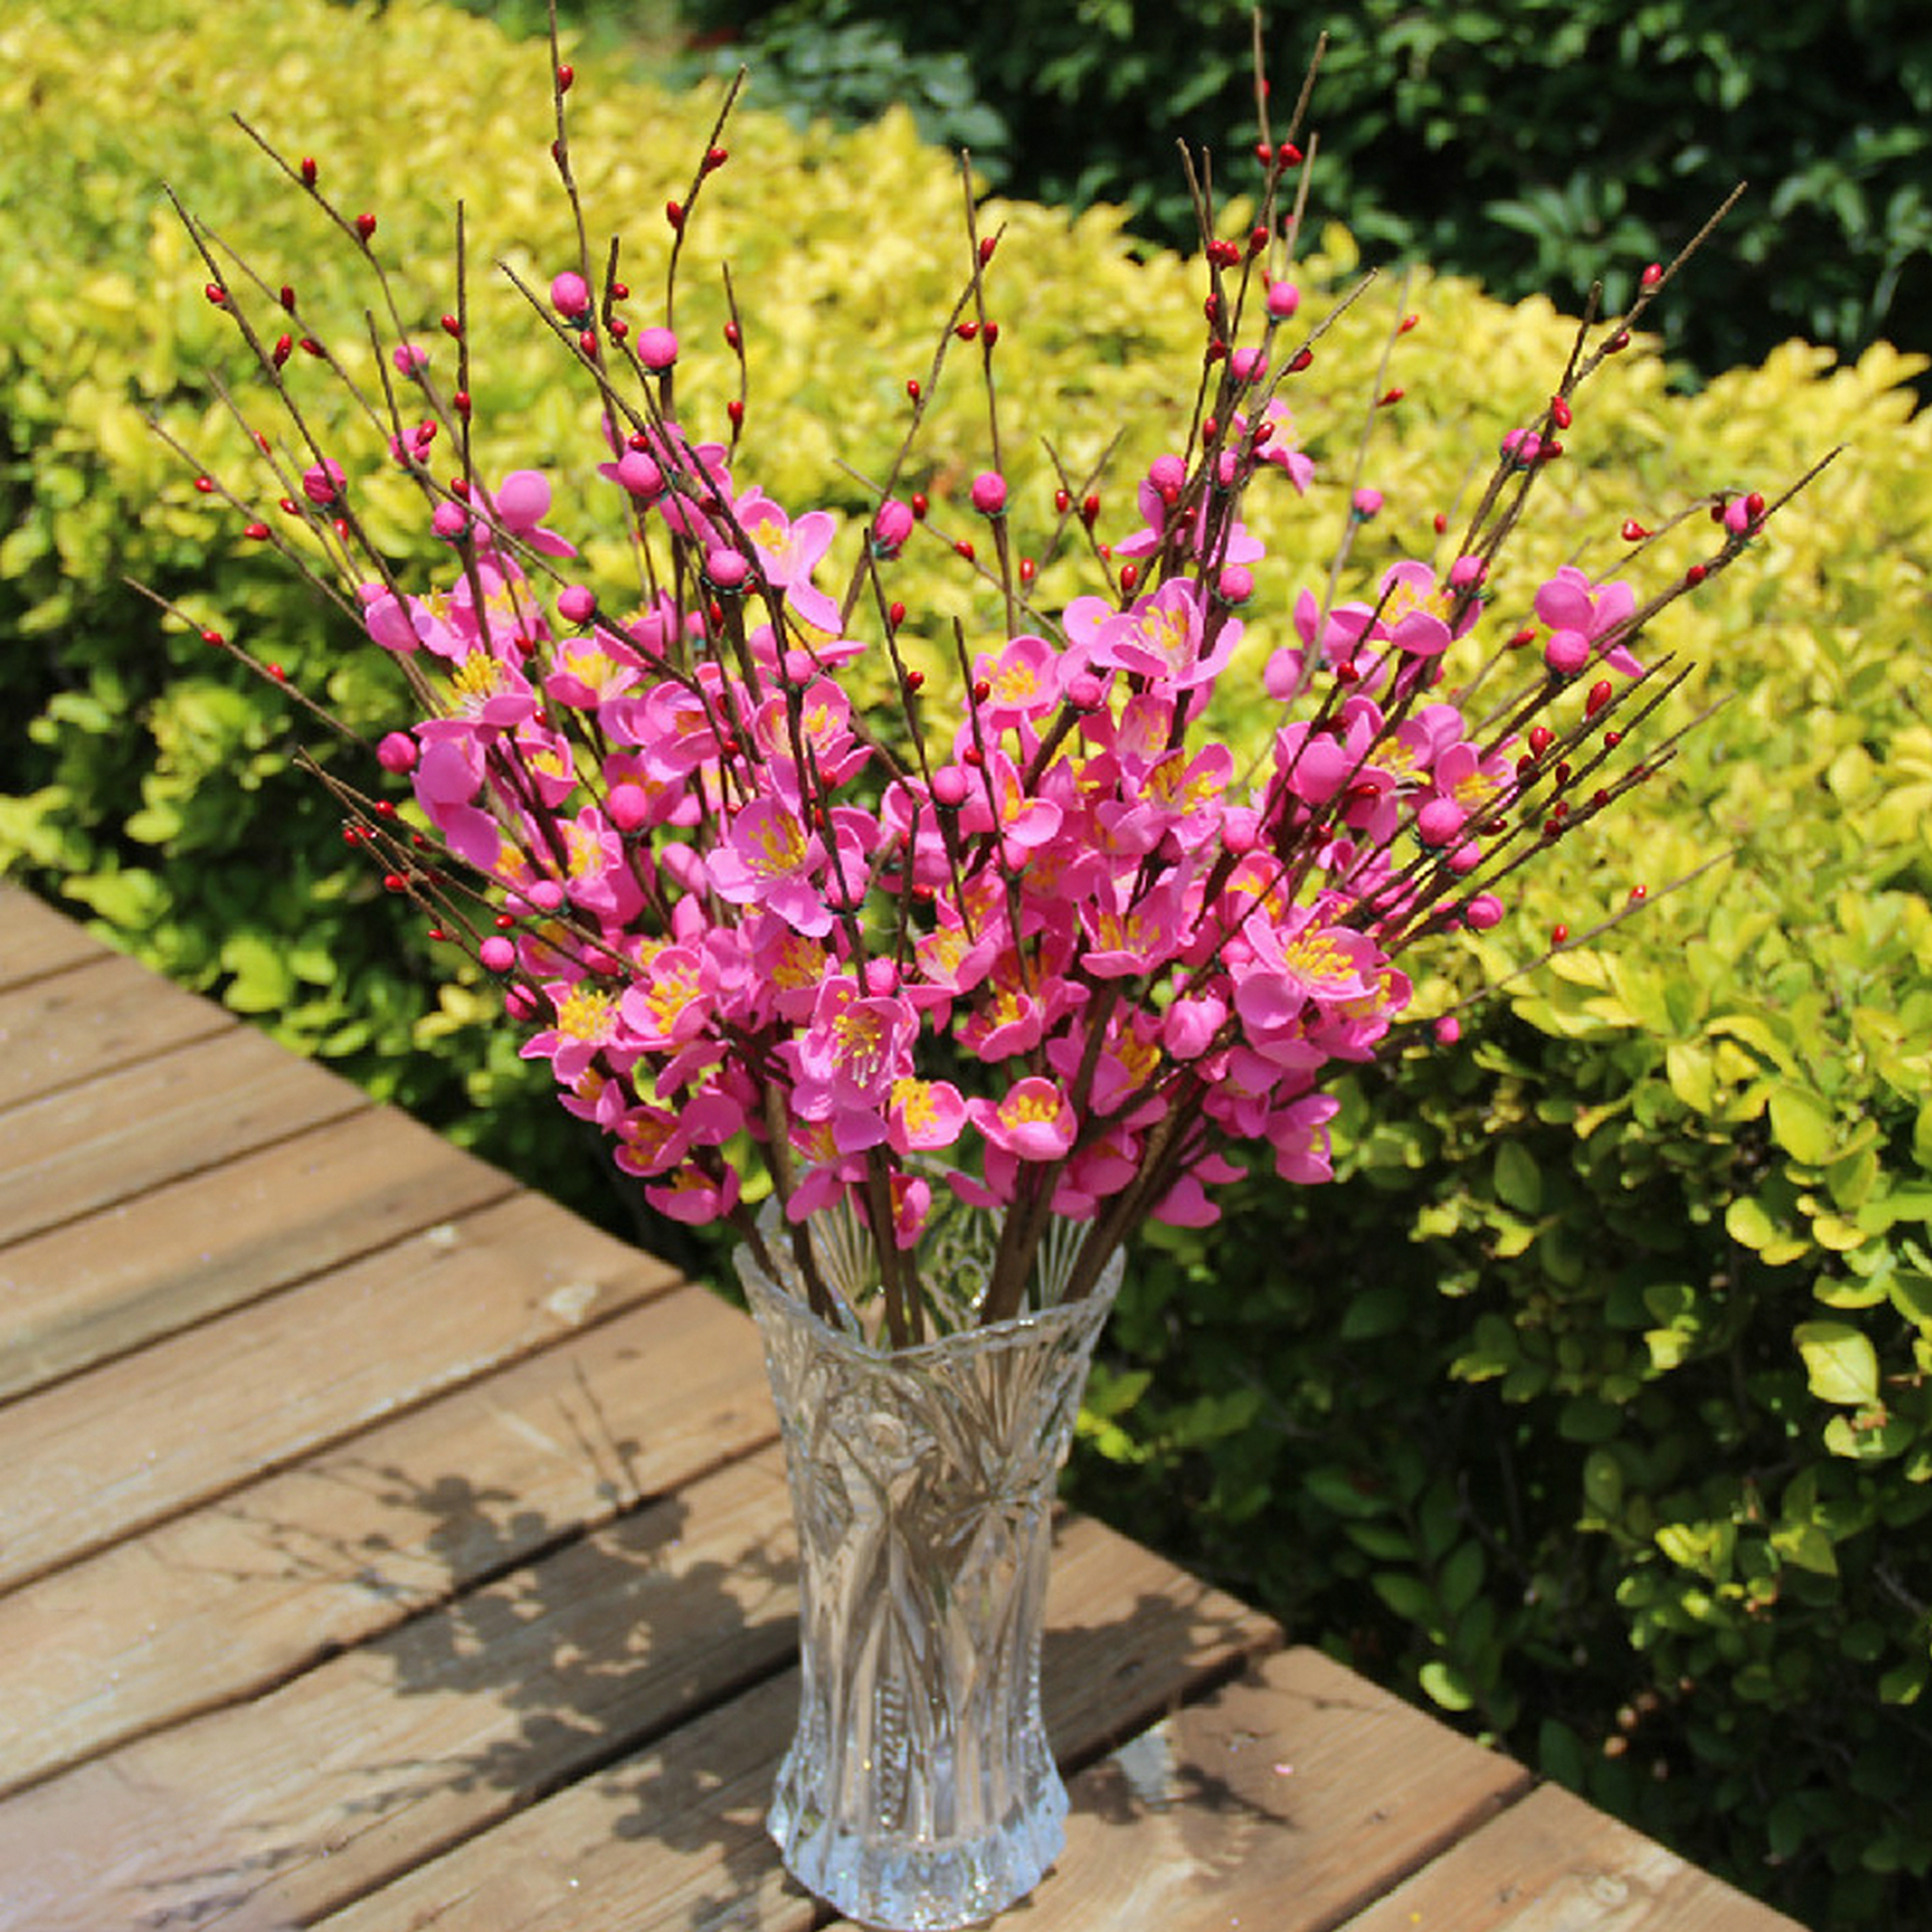 12 Head Houseplant Artificial Winter Bouquet Fake Garden Plant Flower Home Decor Walmart Com Walmart Com